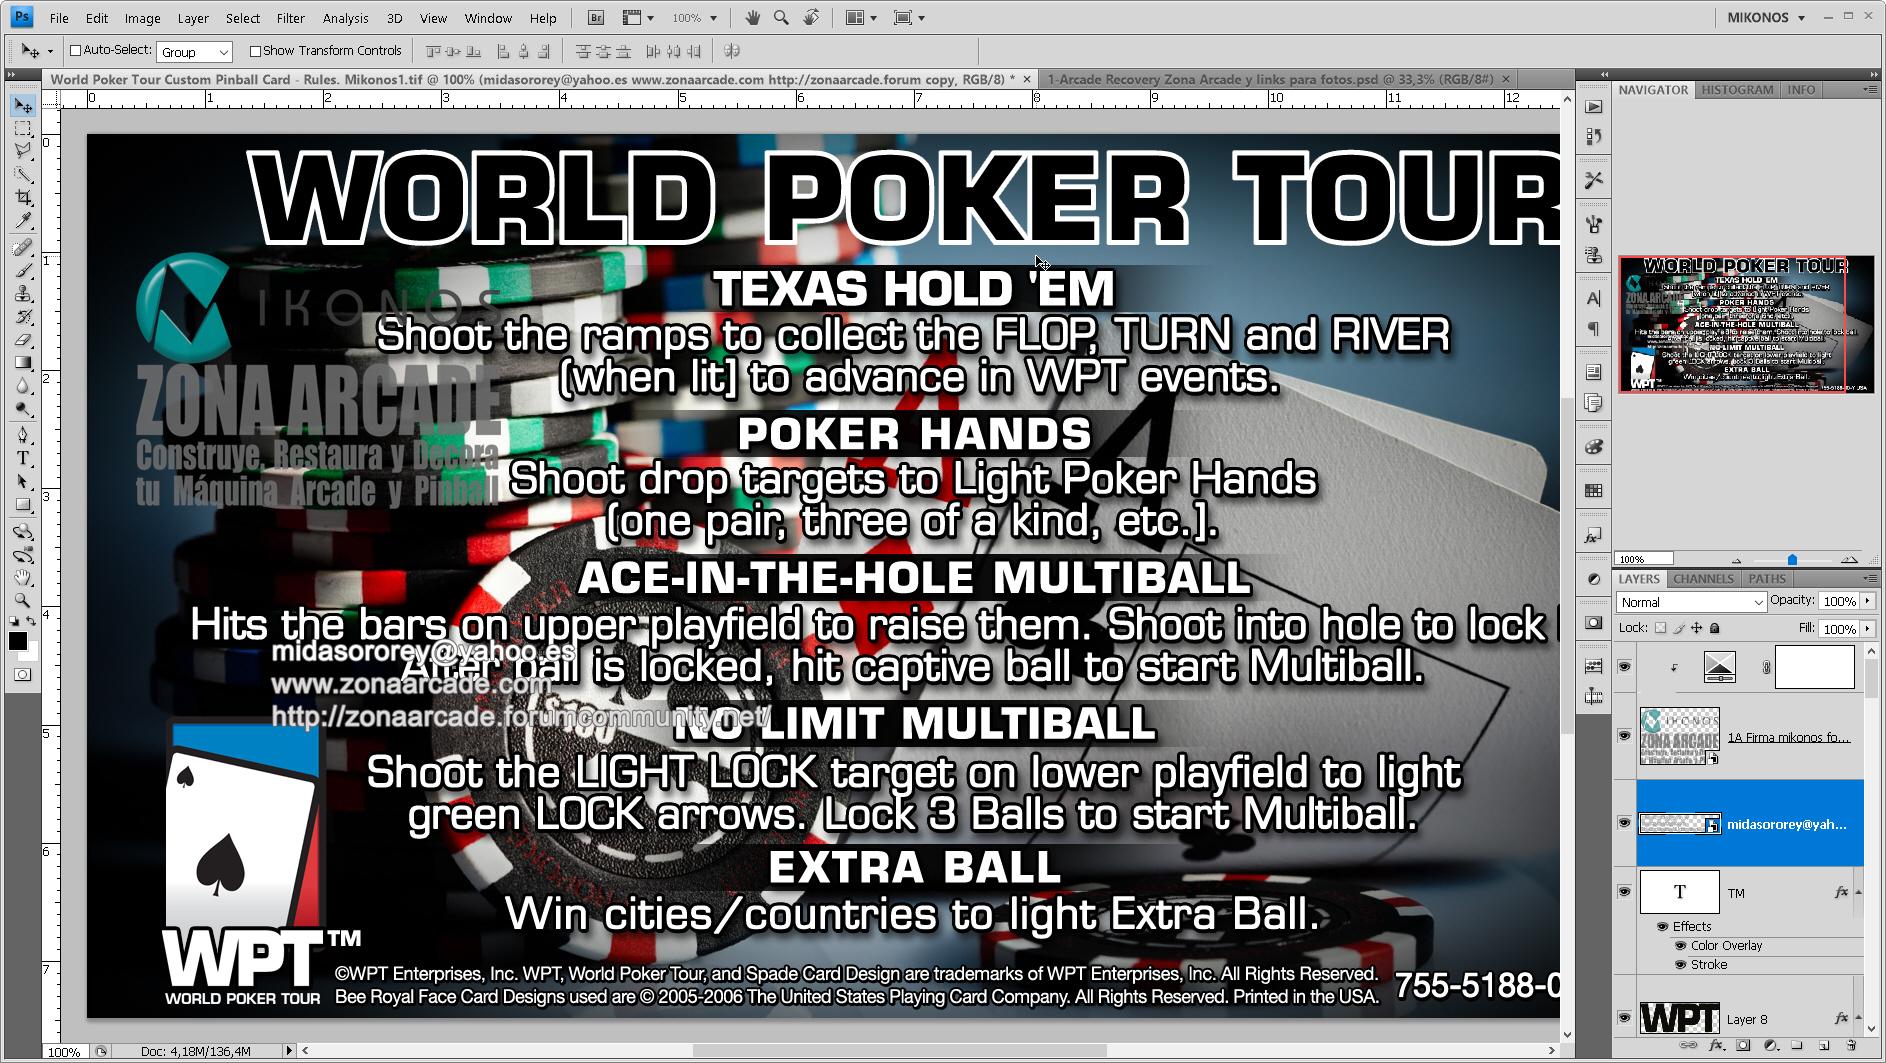 World Poker Tour Pinball Card Customized - Rules. Mikonos2